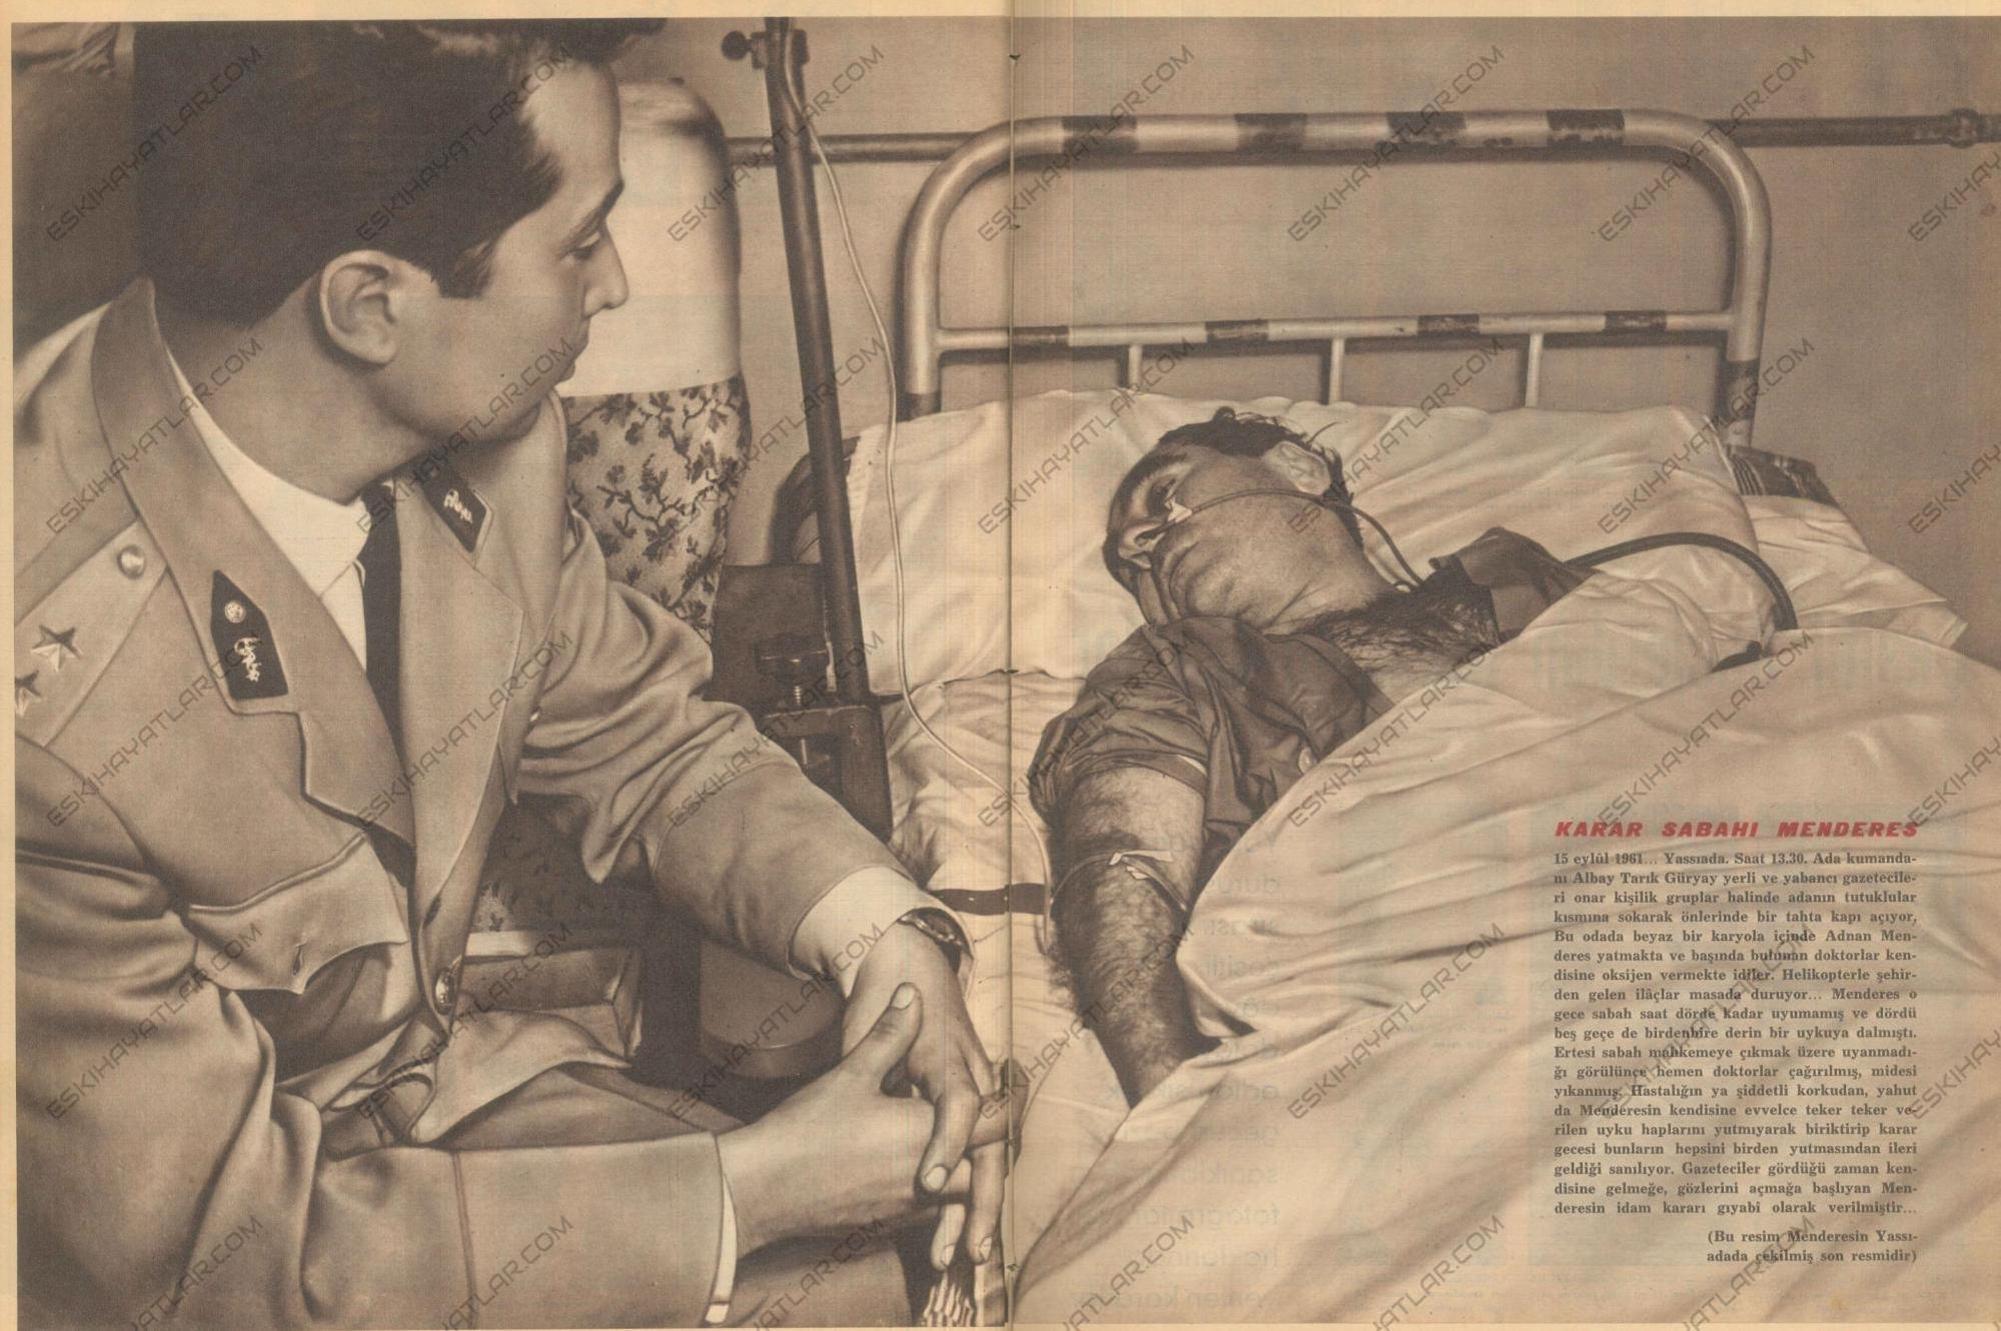 1960-ihtilali-idam-edilenler-adnan-menderes-hasan-polatkan-fatin-rustu-zorlu-yassiada-tutanaklari-1961-hayat-dergisi-arsivleri (9)